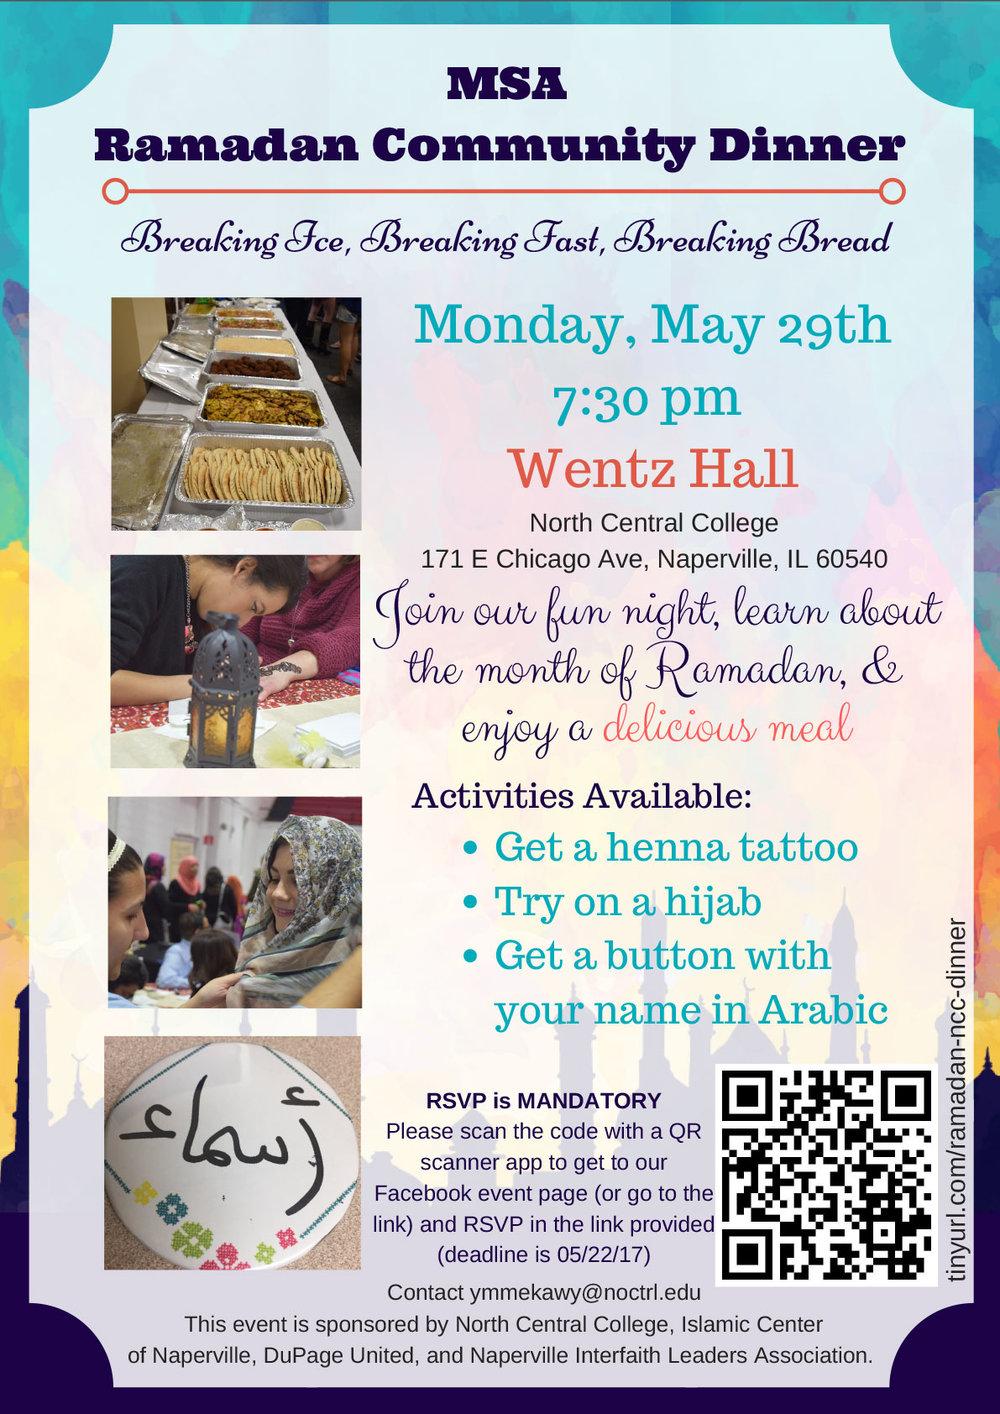 MSA-Ramadan-Community-Dinner.jpg